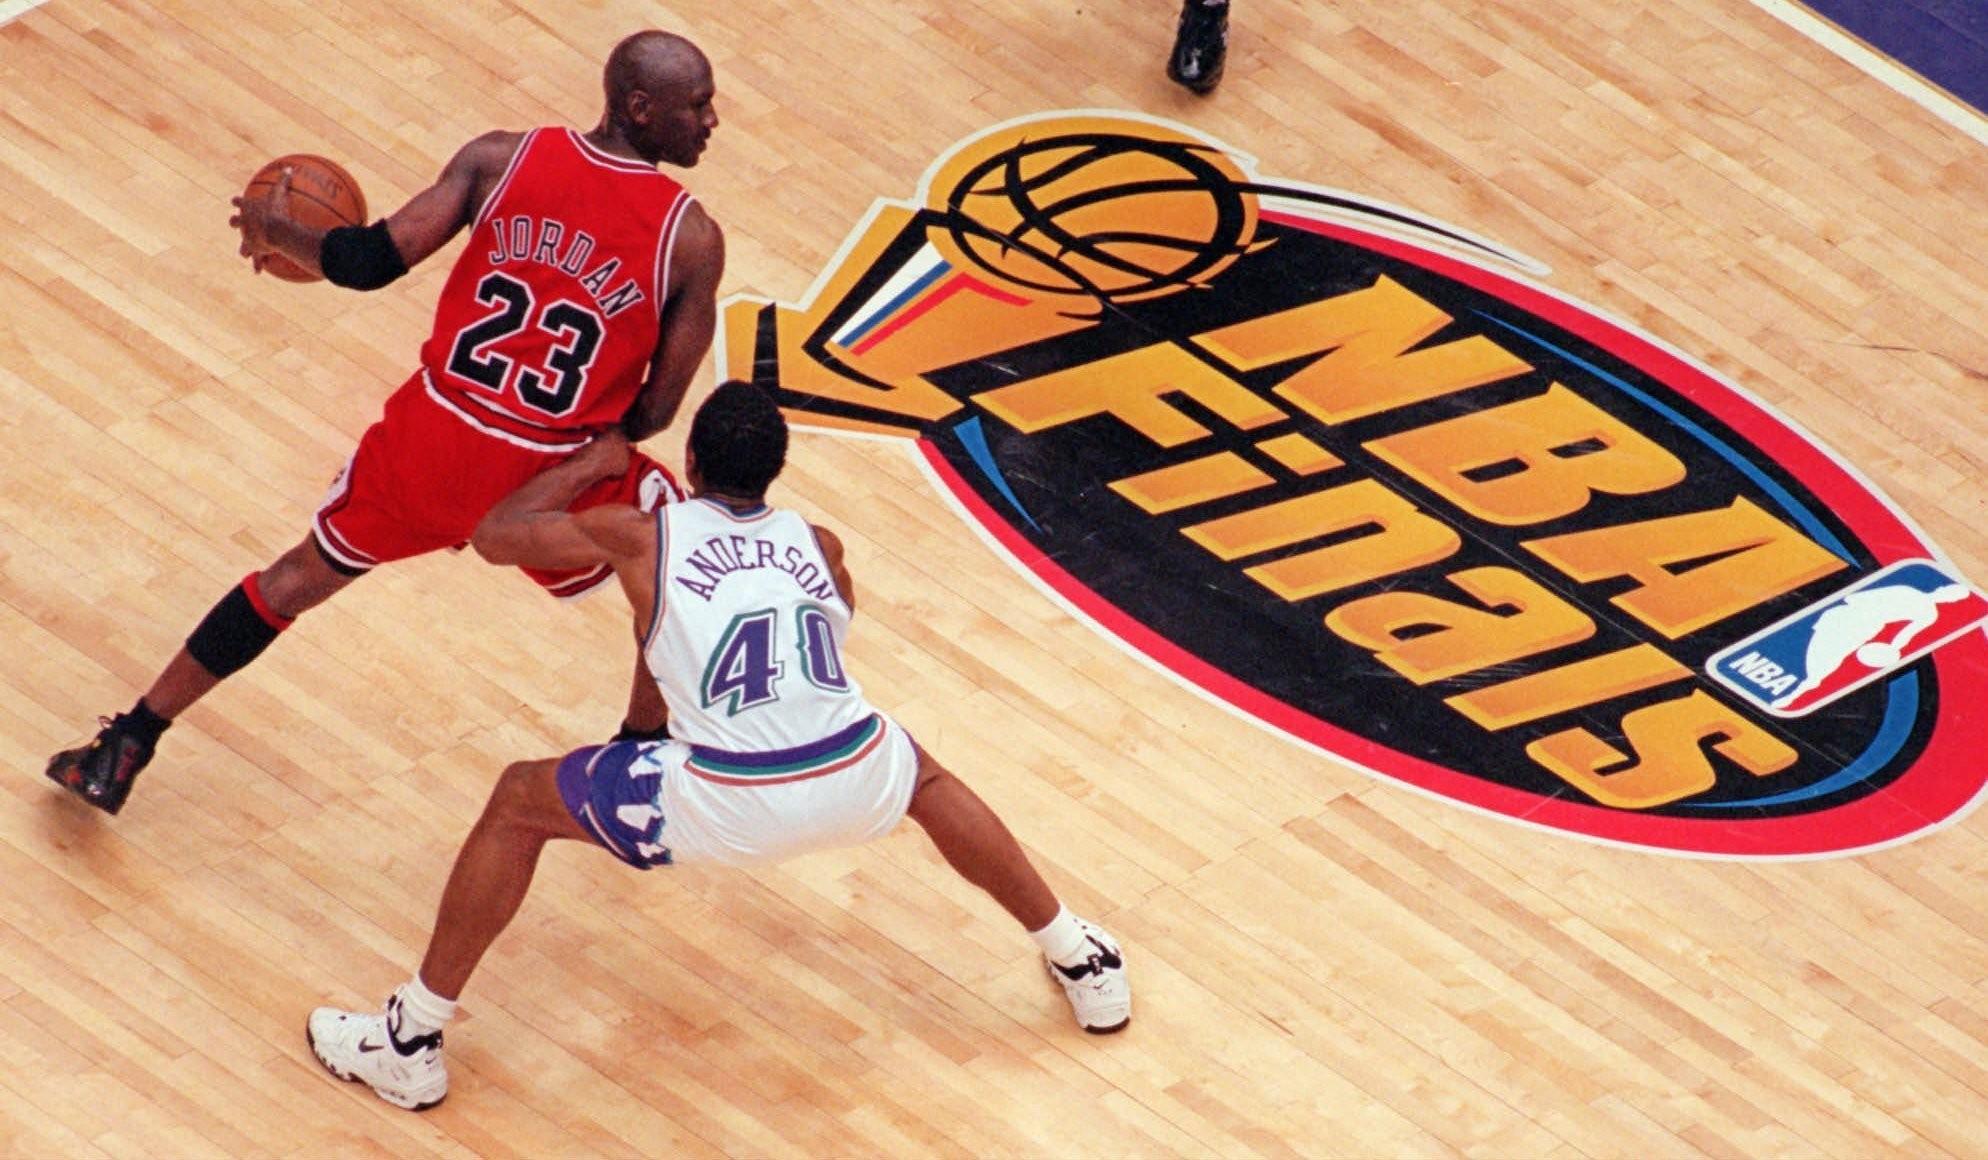 Michael Jordan's 'Last Shot' shoes will